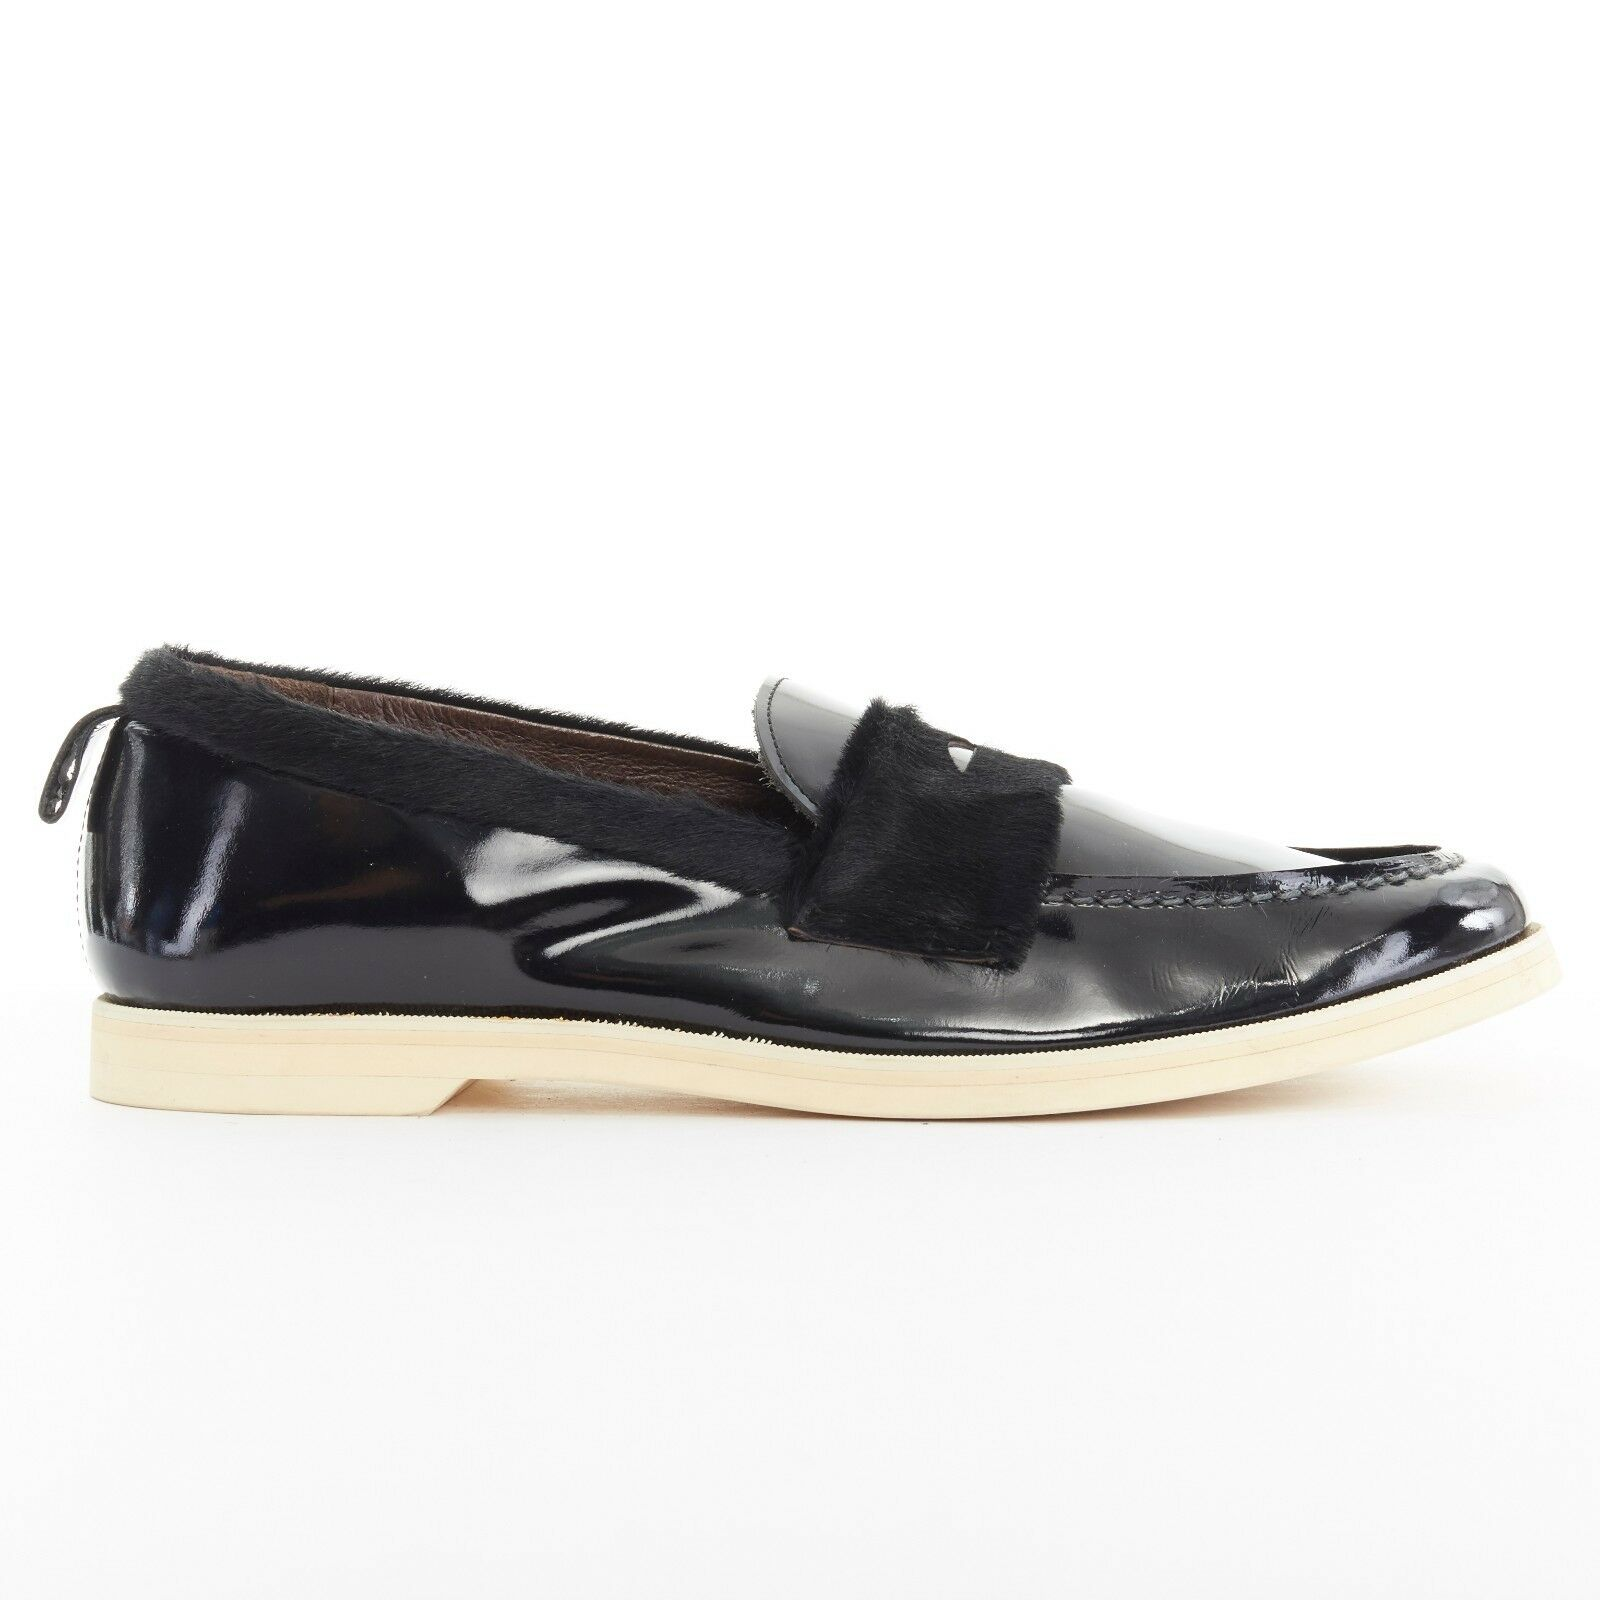 Runway KOLOR AW13 black fur shiney leather penny loafer shoes JP28.5 US11 EU44.5